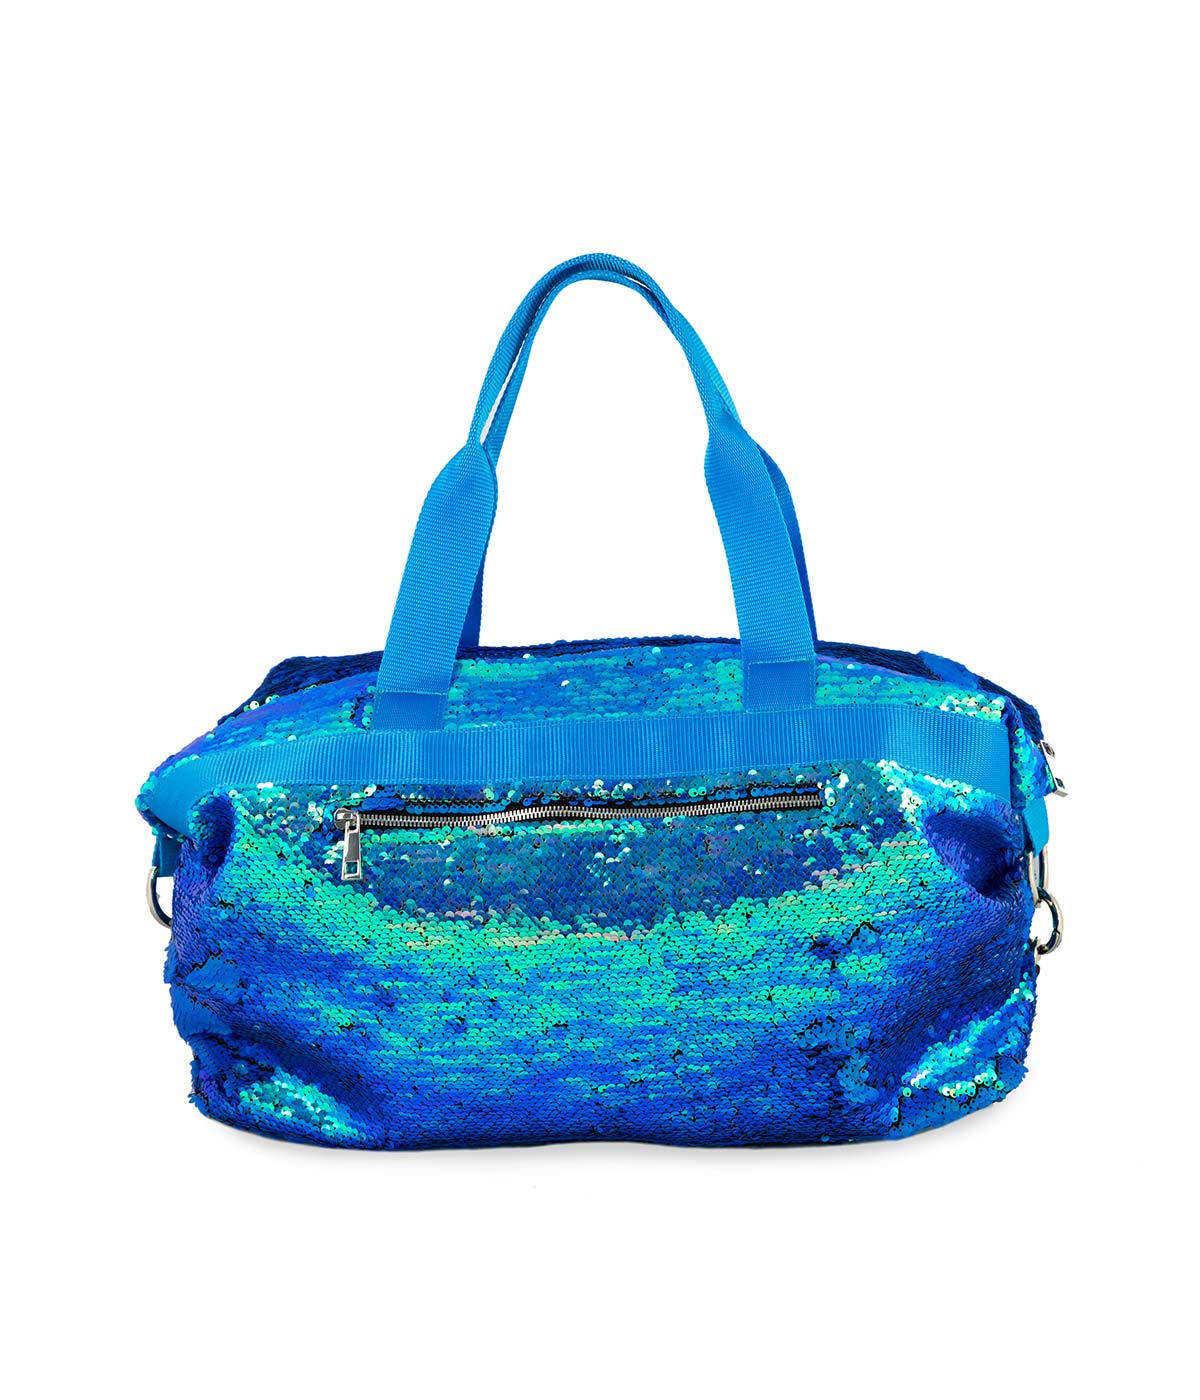 bBorsone Borsa Grande Paillettes Azzurra Quitto Bags